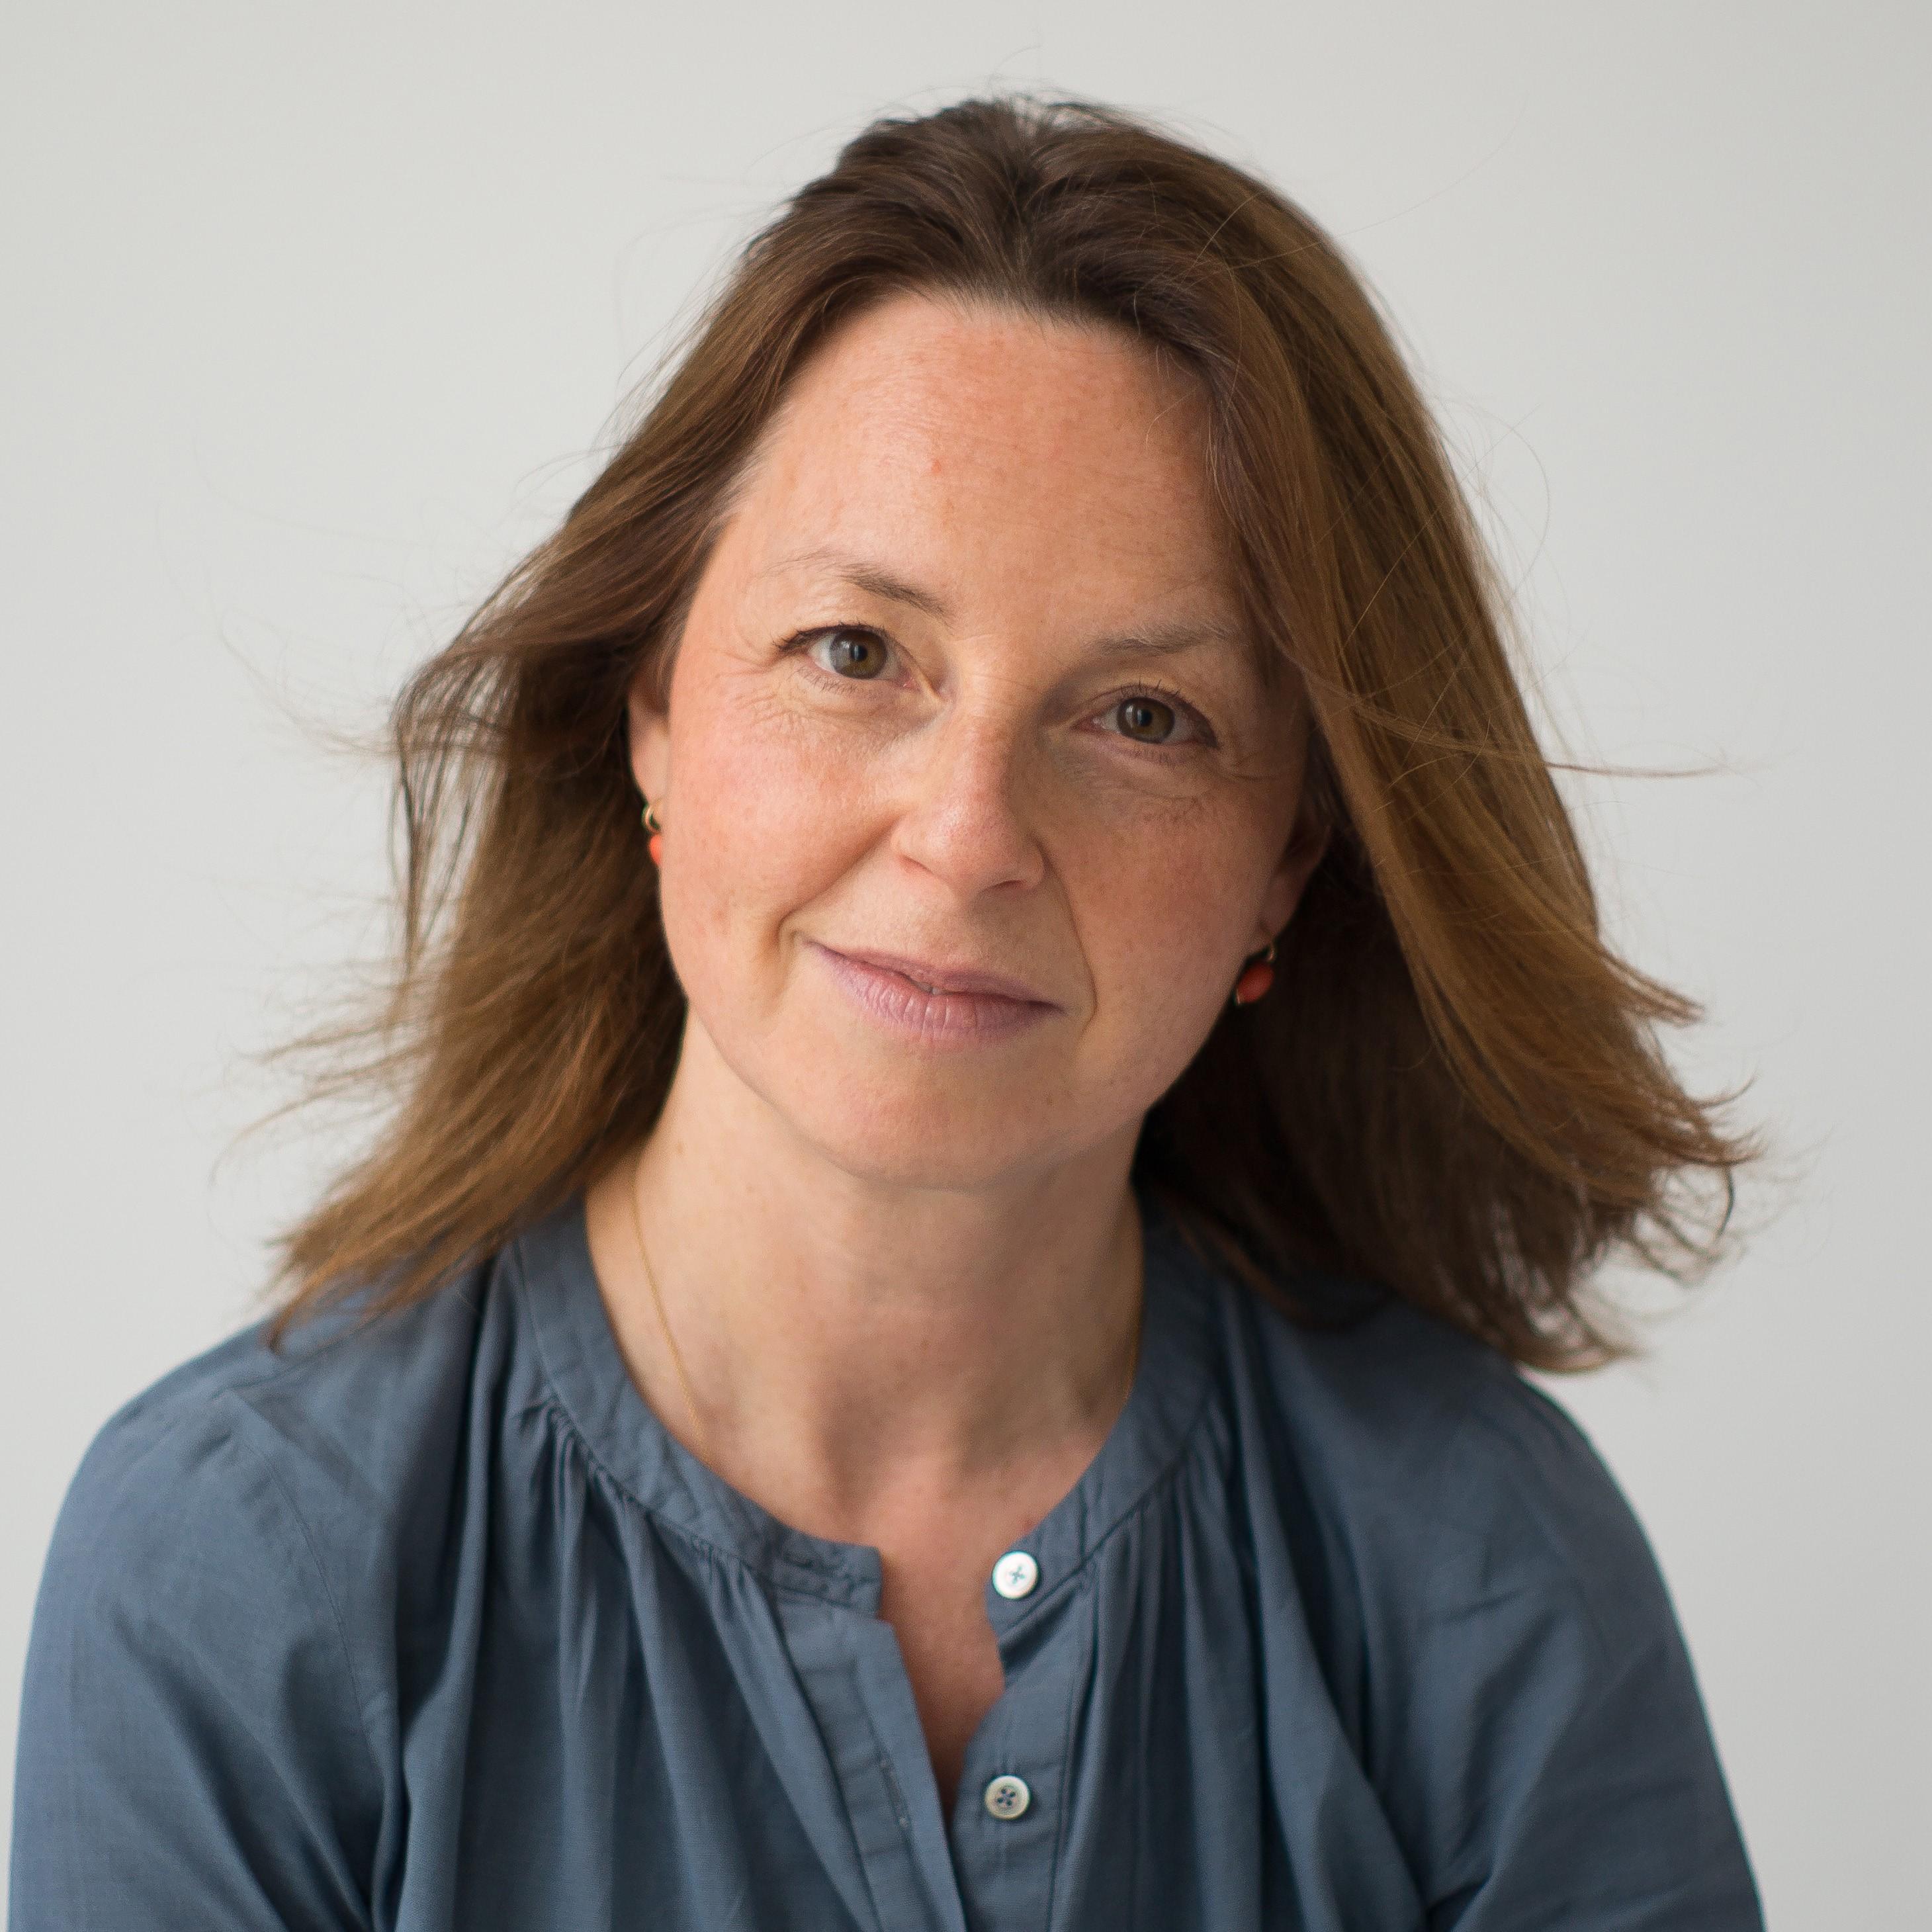 Barbara Visser, 2017 © Wouter Pleijsier